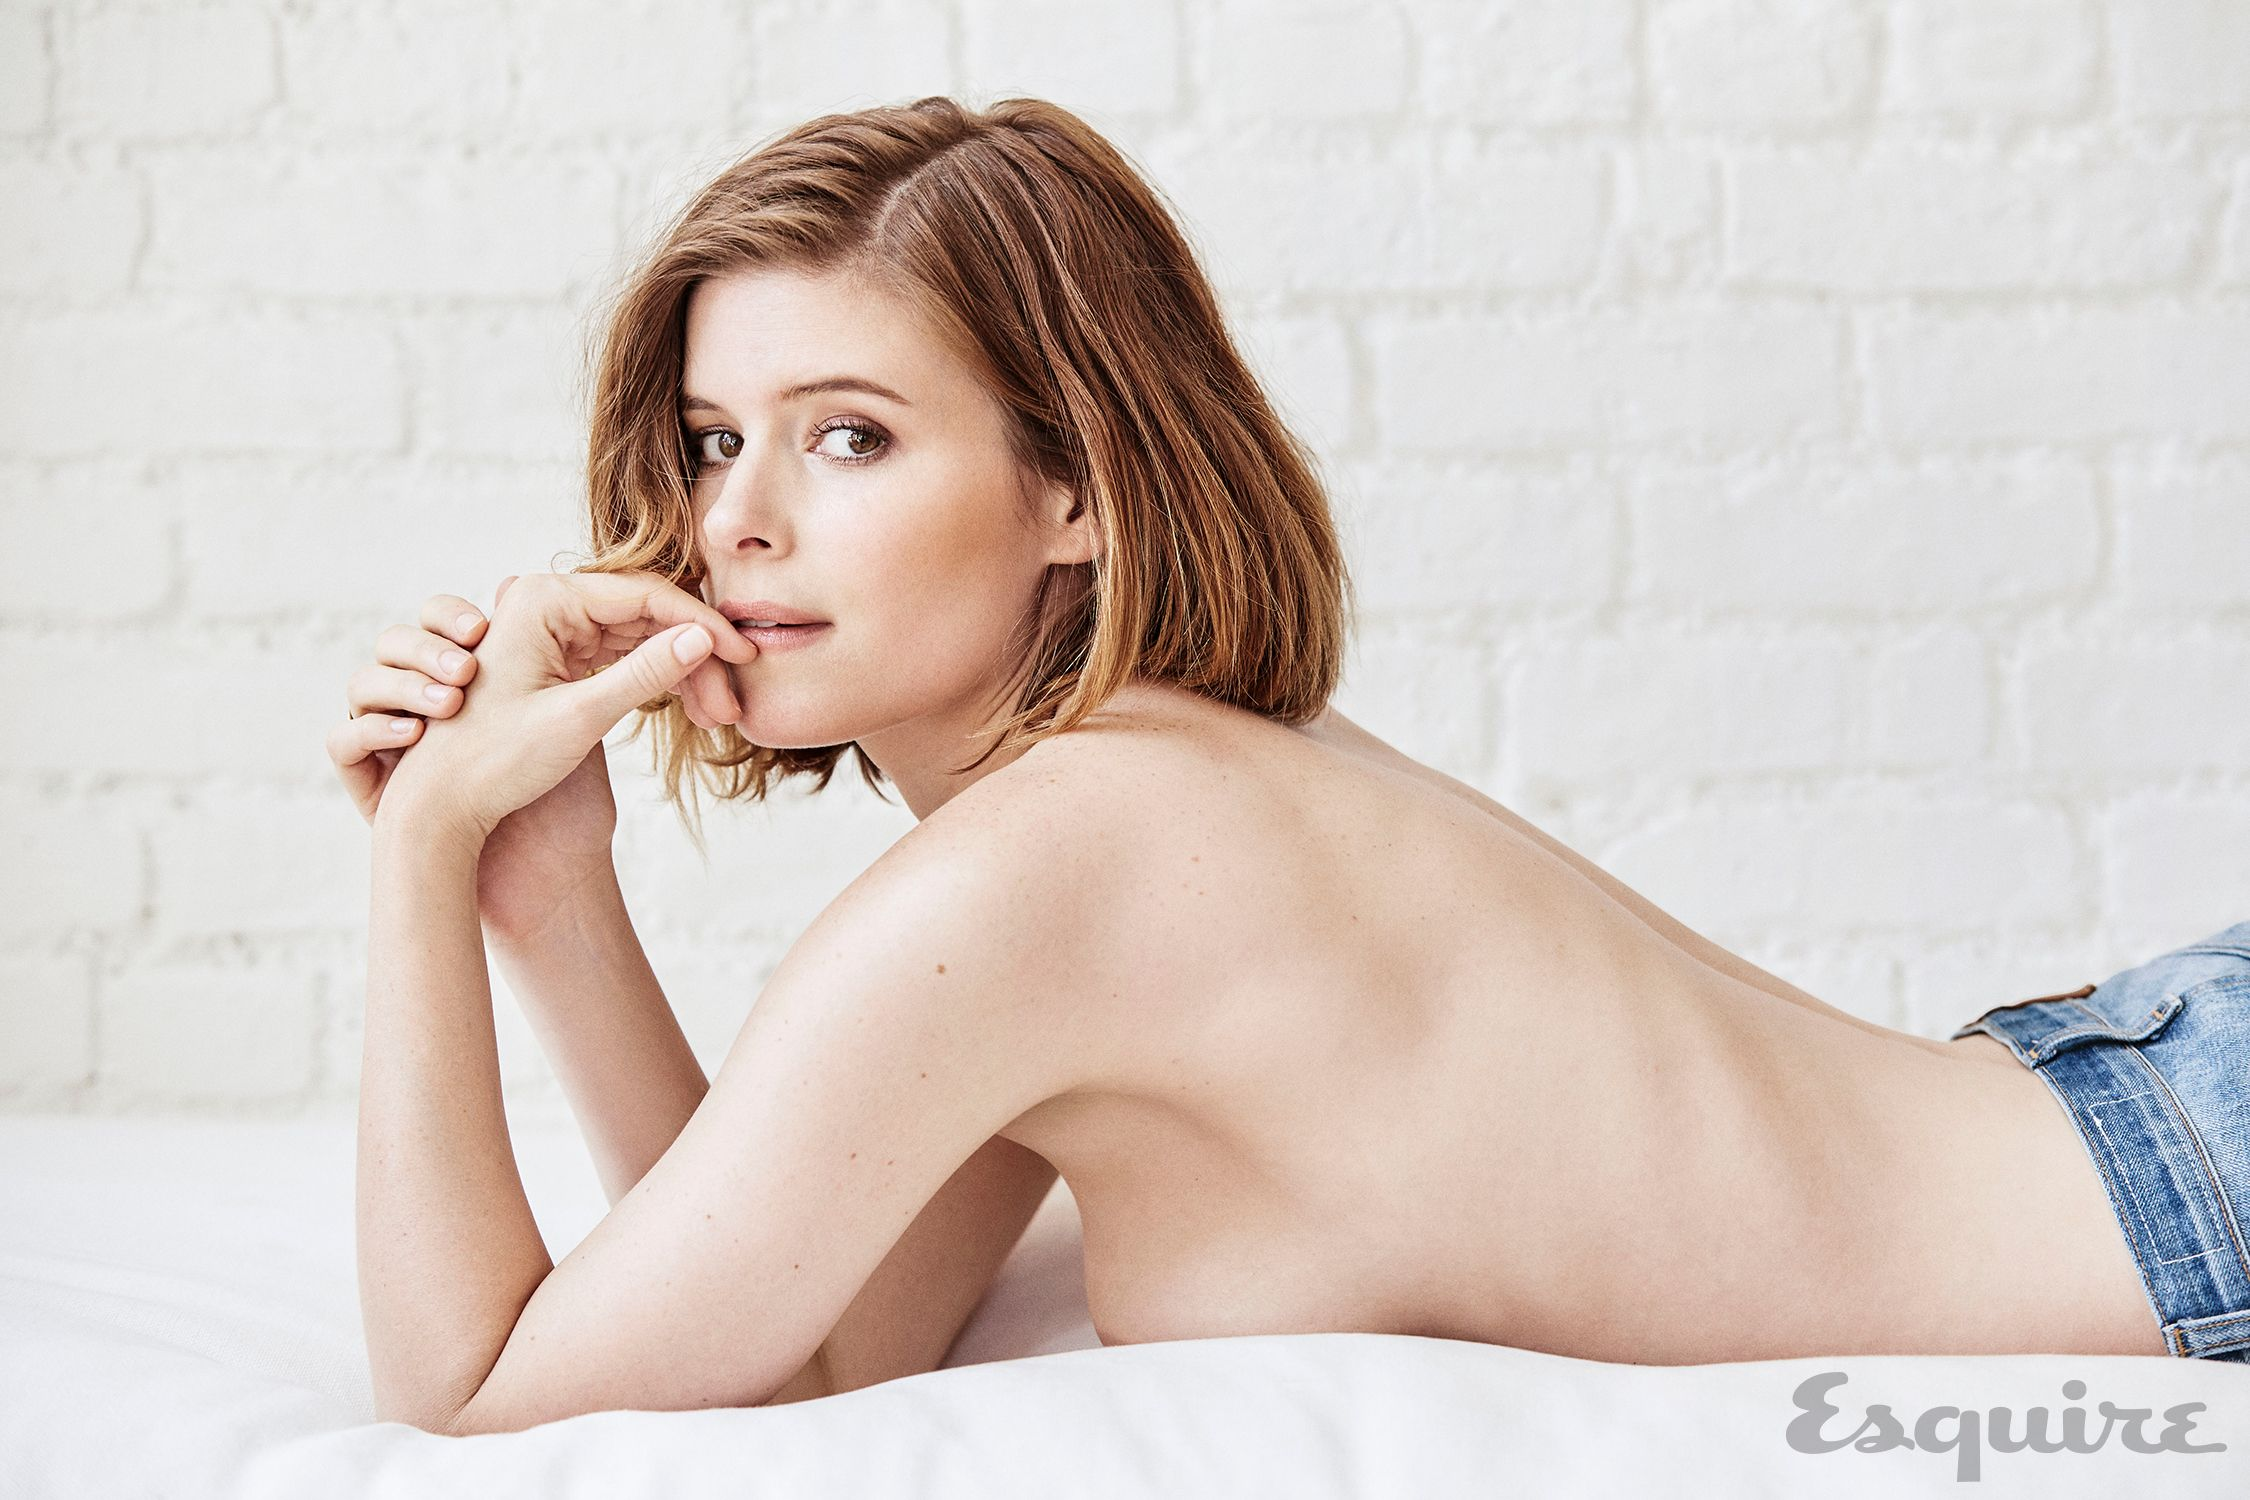 Naked women are beautiful